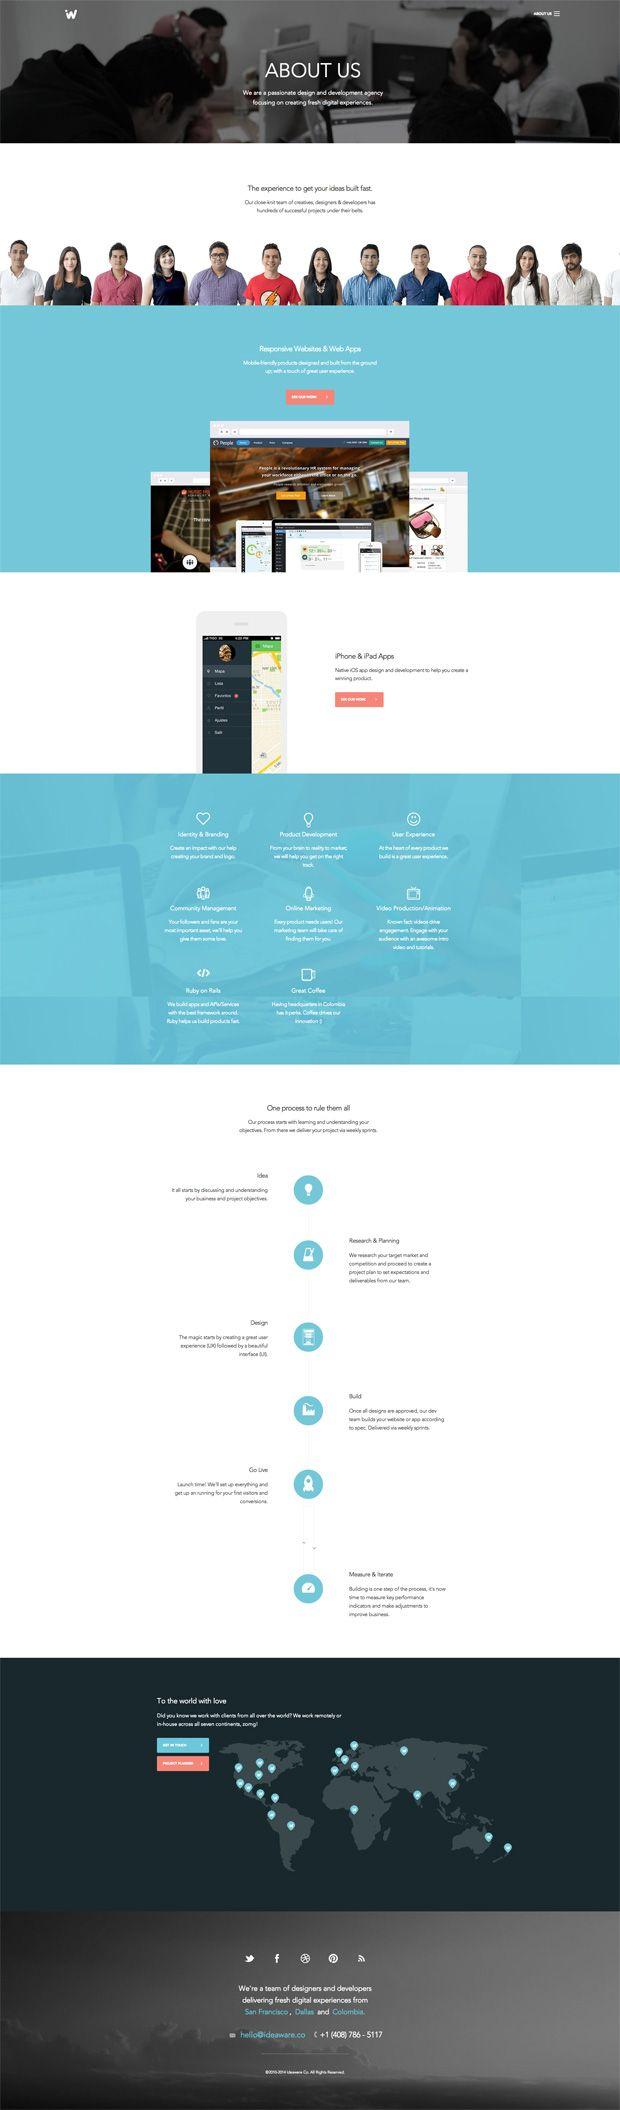 13 best Asimov Brand images on Pinterest | Design web, Design ...